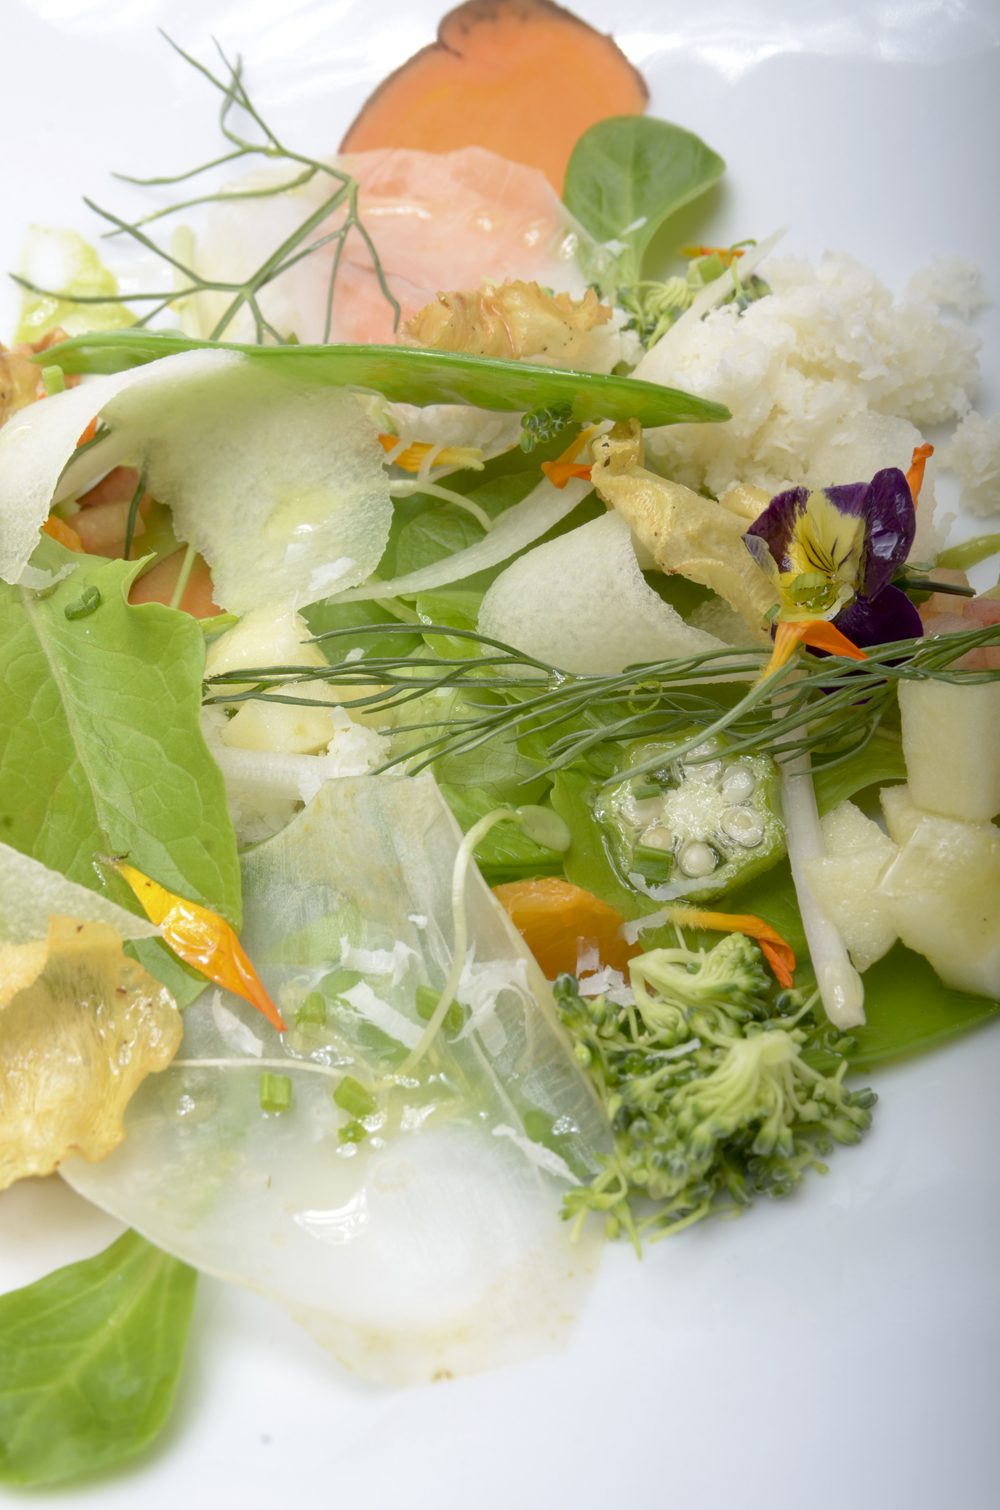 blenheim farm salad.jpg